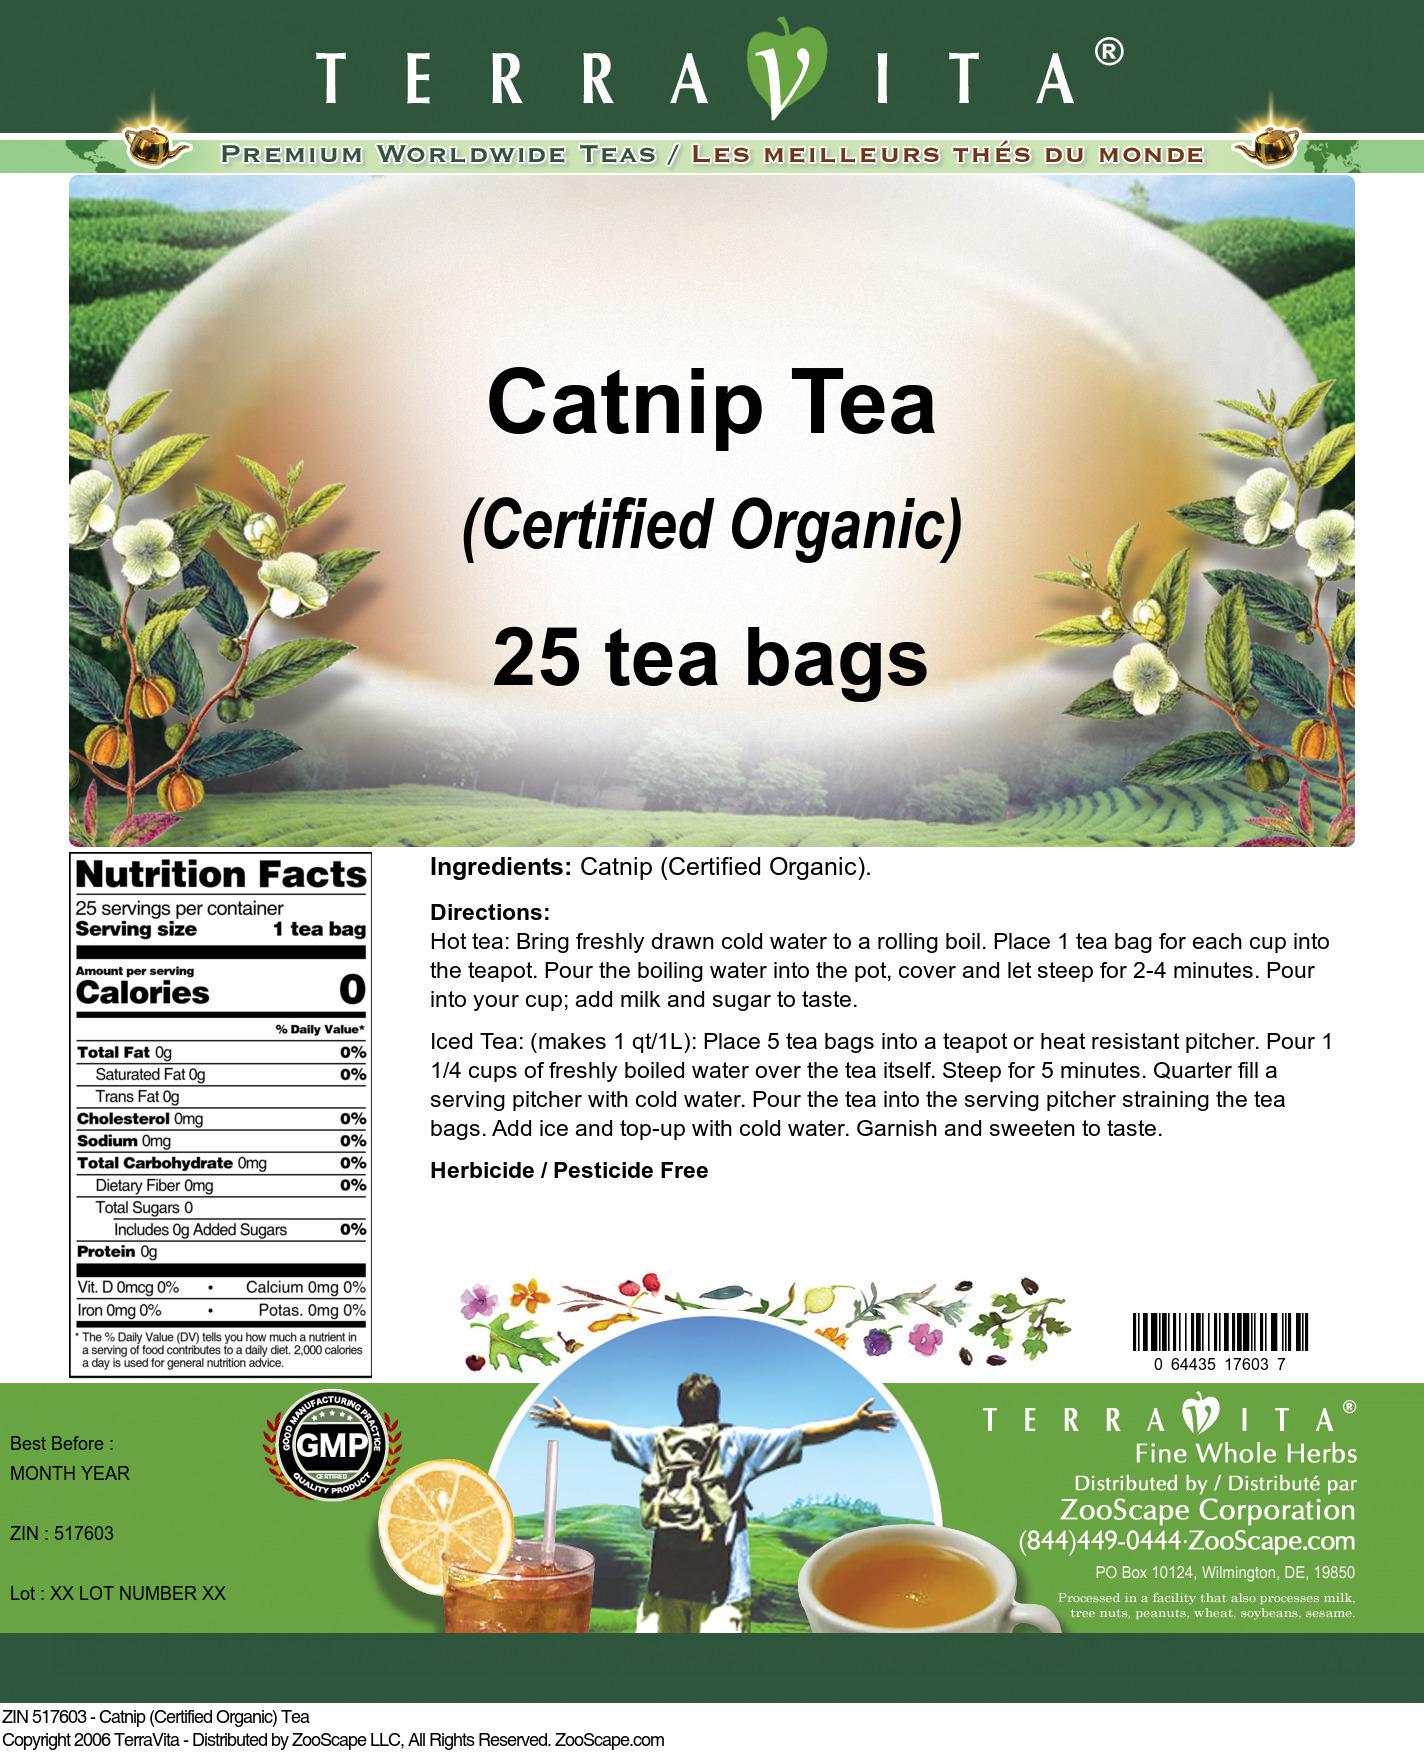 Catnip (Certified Organic) Tea - Label